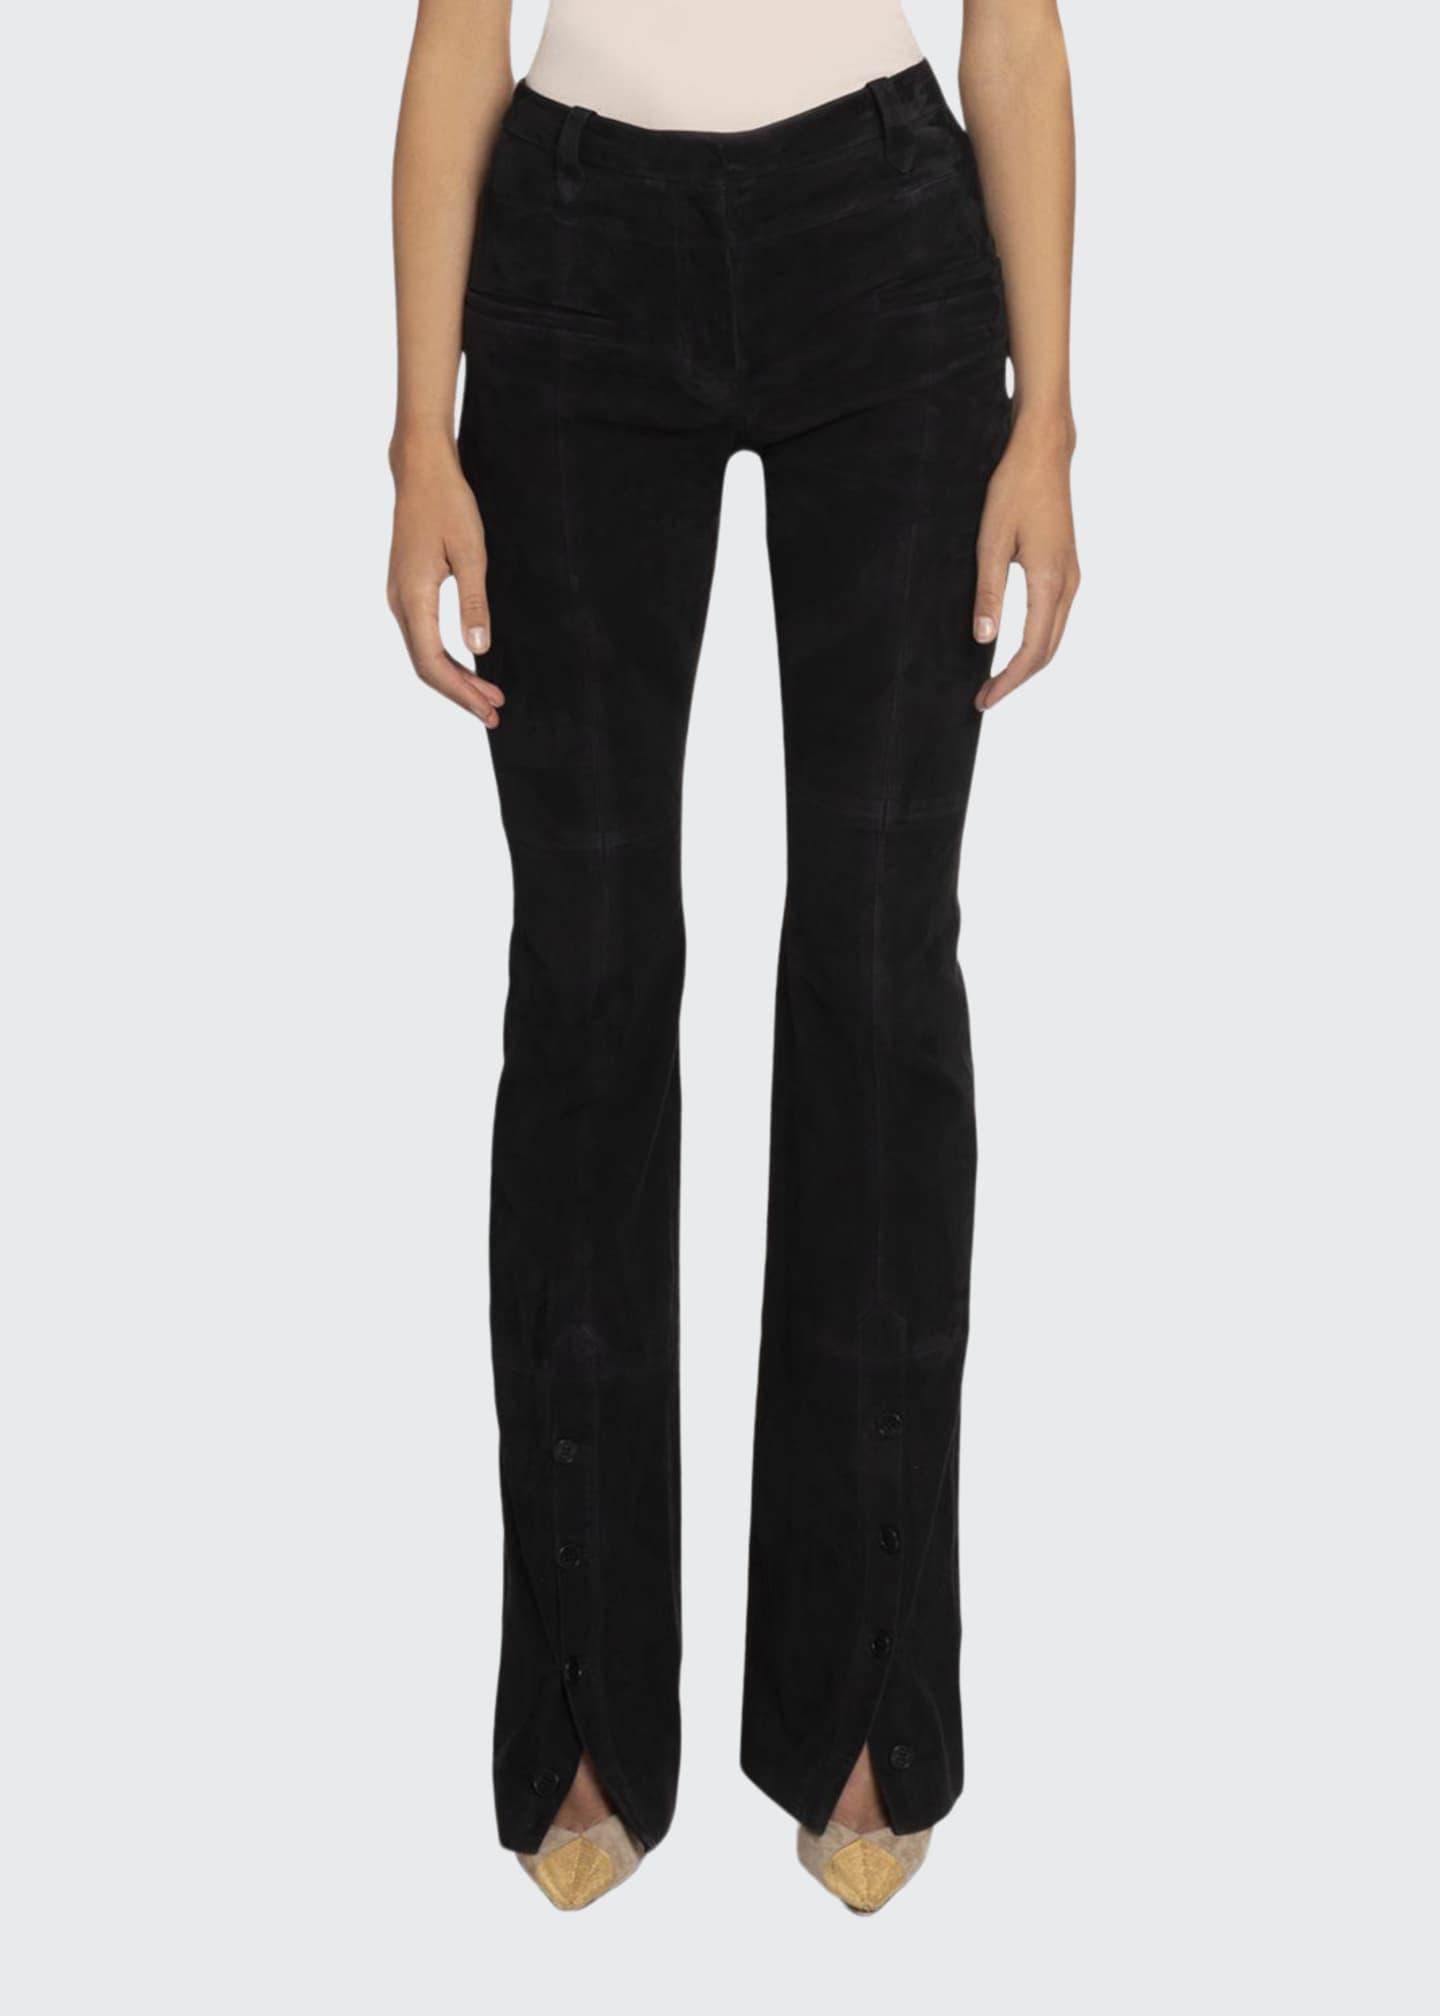 Altuzarra High-Rise Flare-Leg Suede Pants